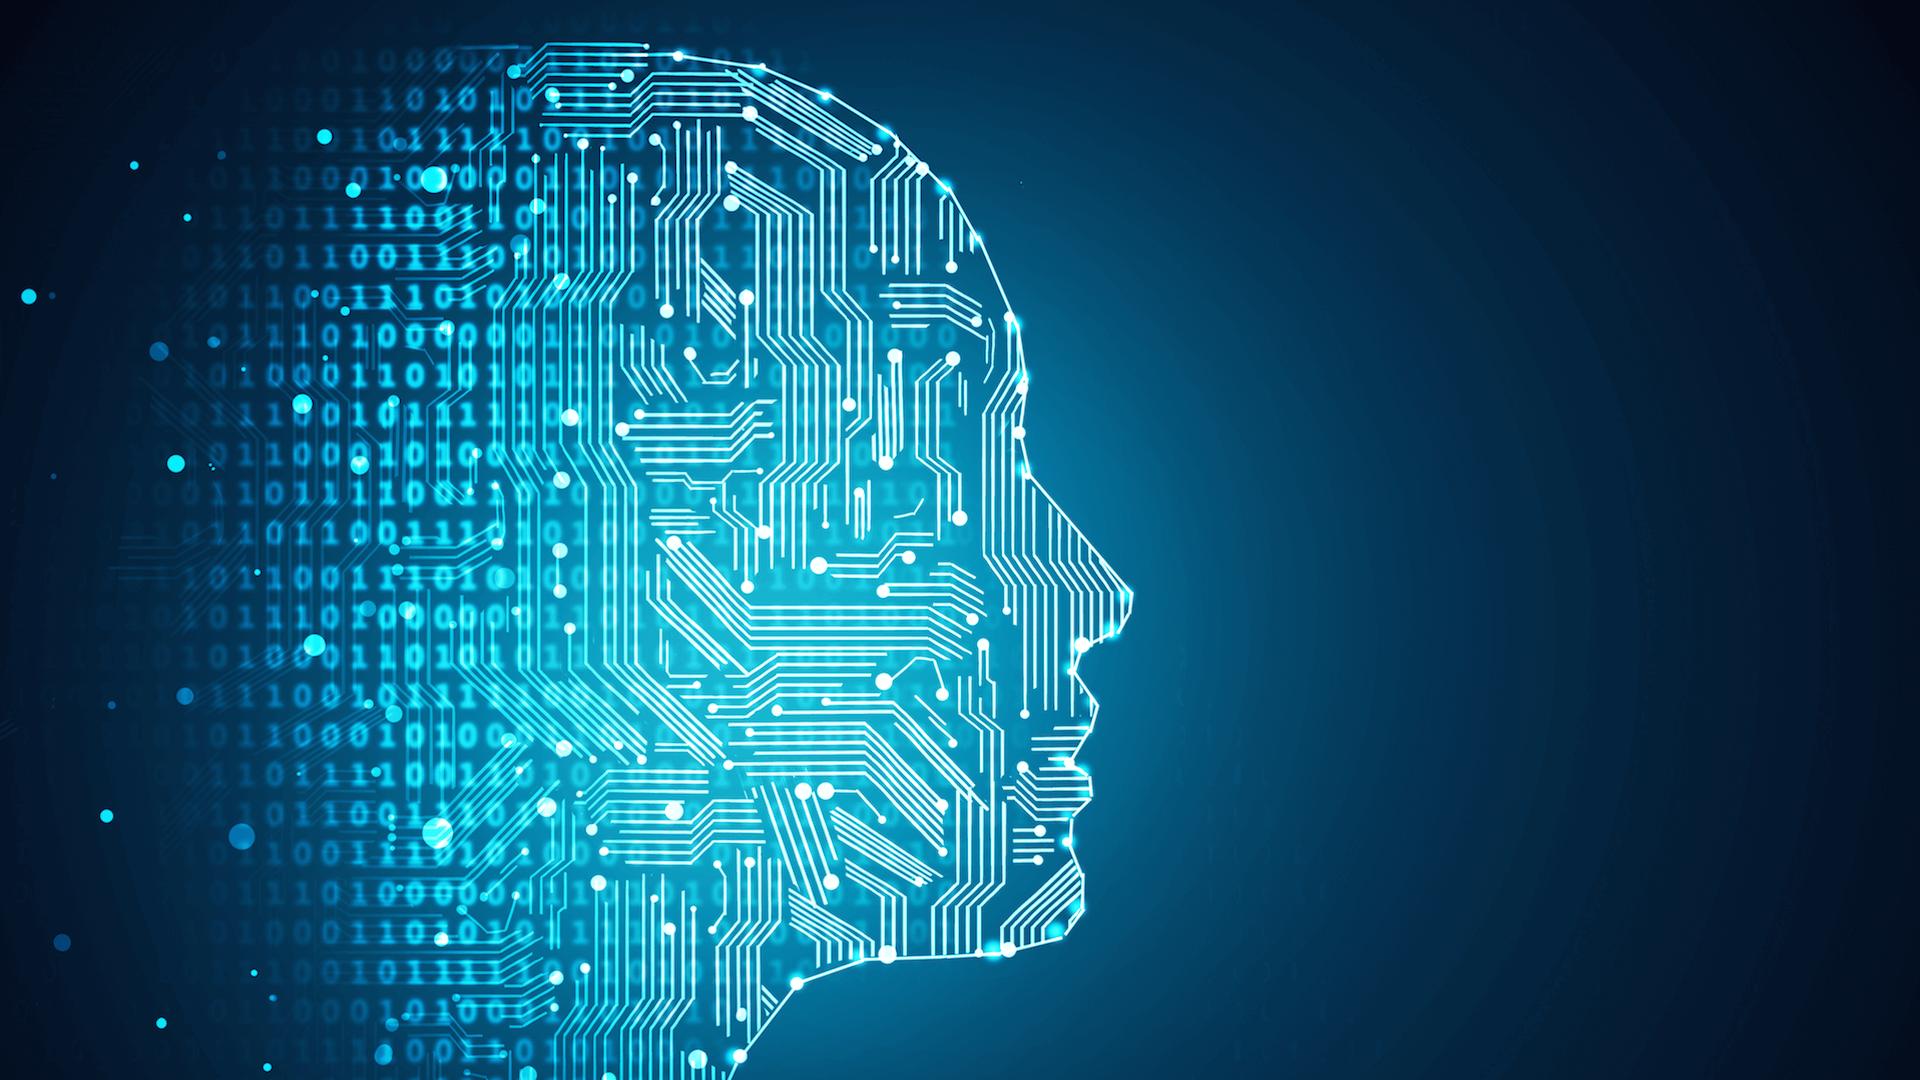 Sprinklr adds AI to its customer experience platform 1920x1080